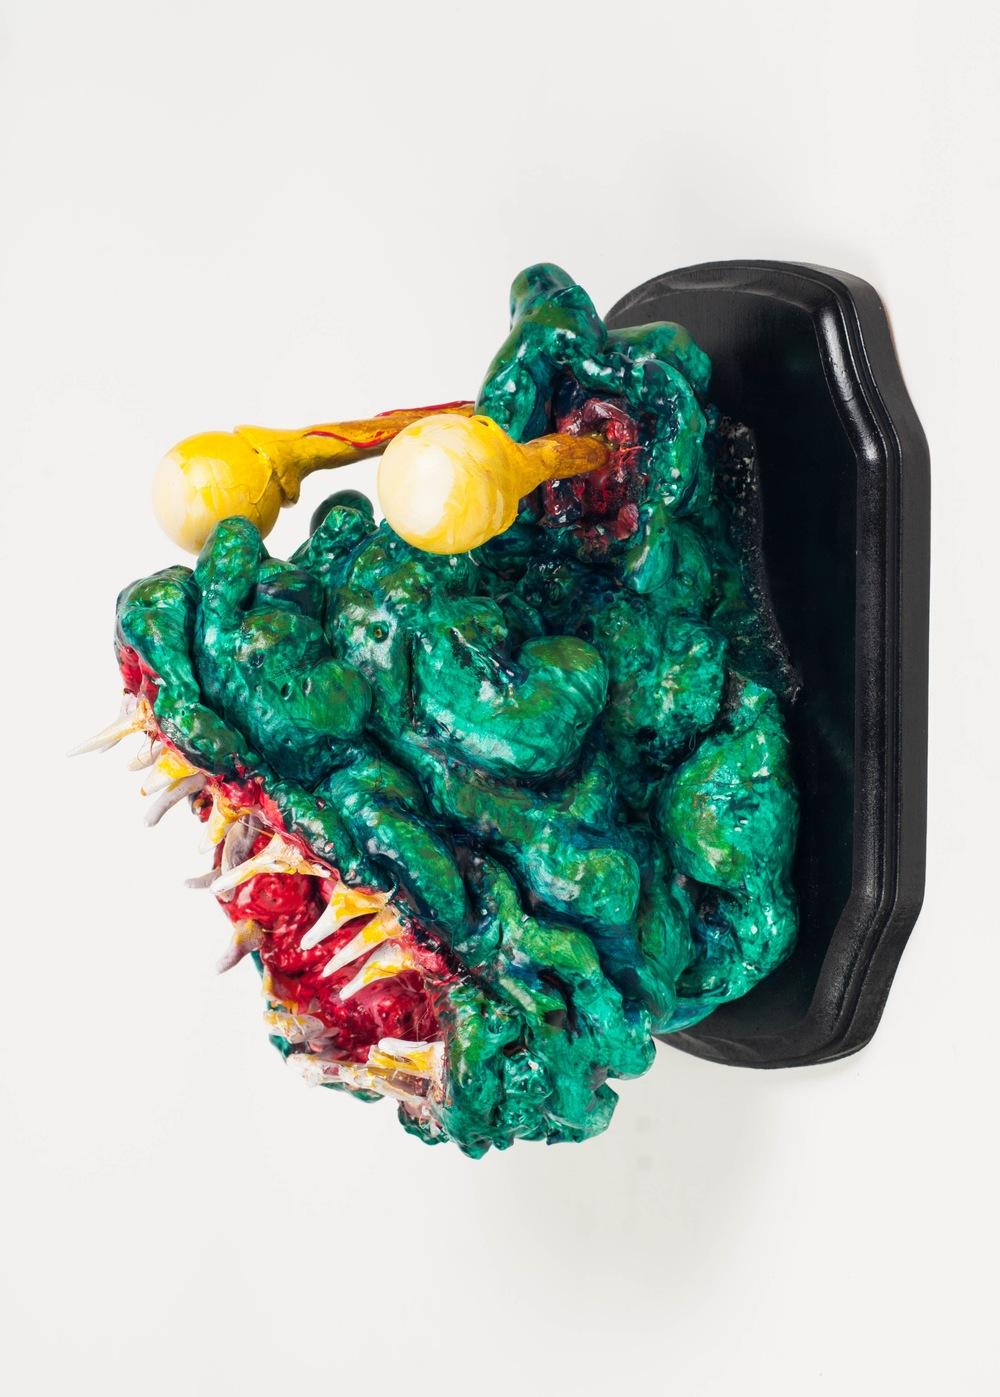 Bobby Cilantro Sculptures 01.10.15 (14 of 117).jpg